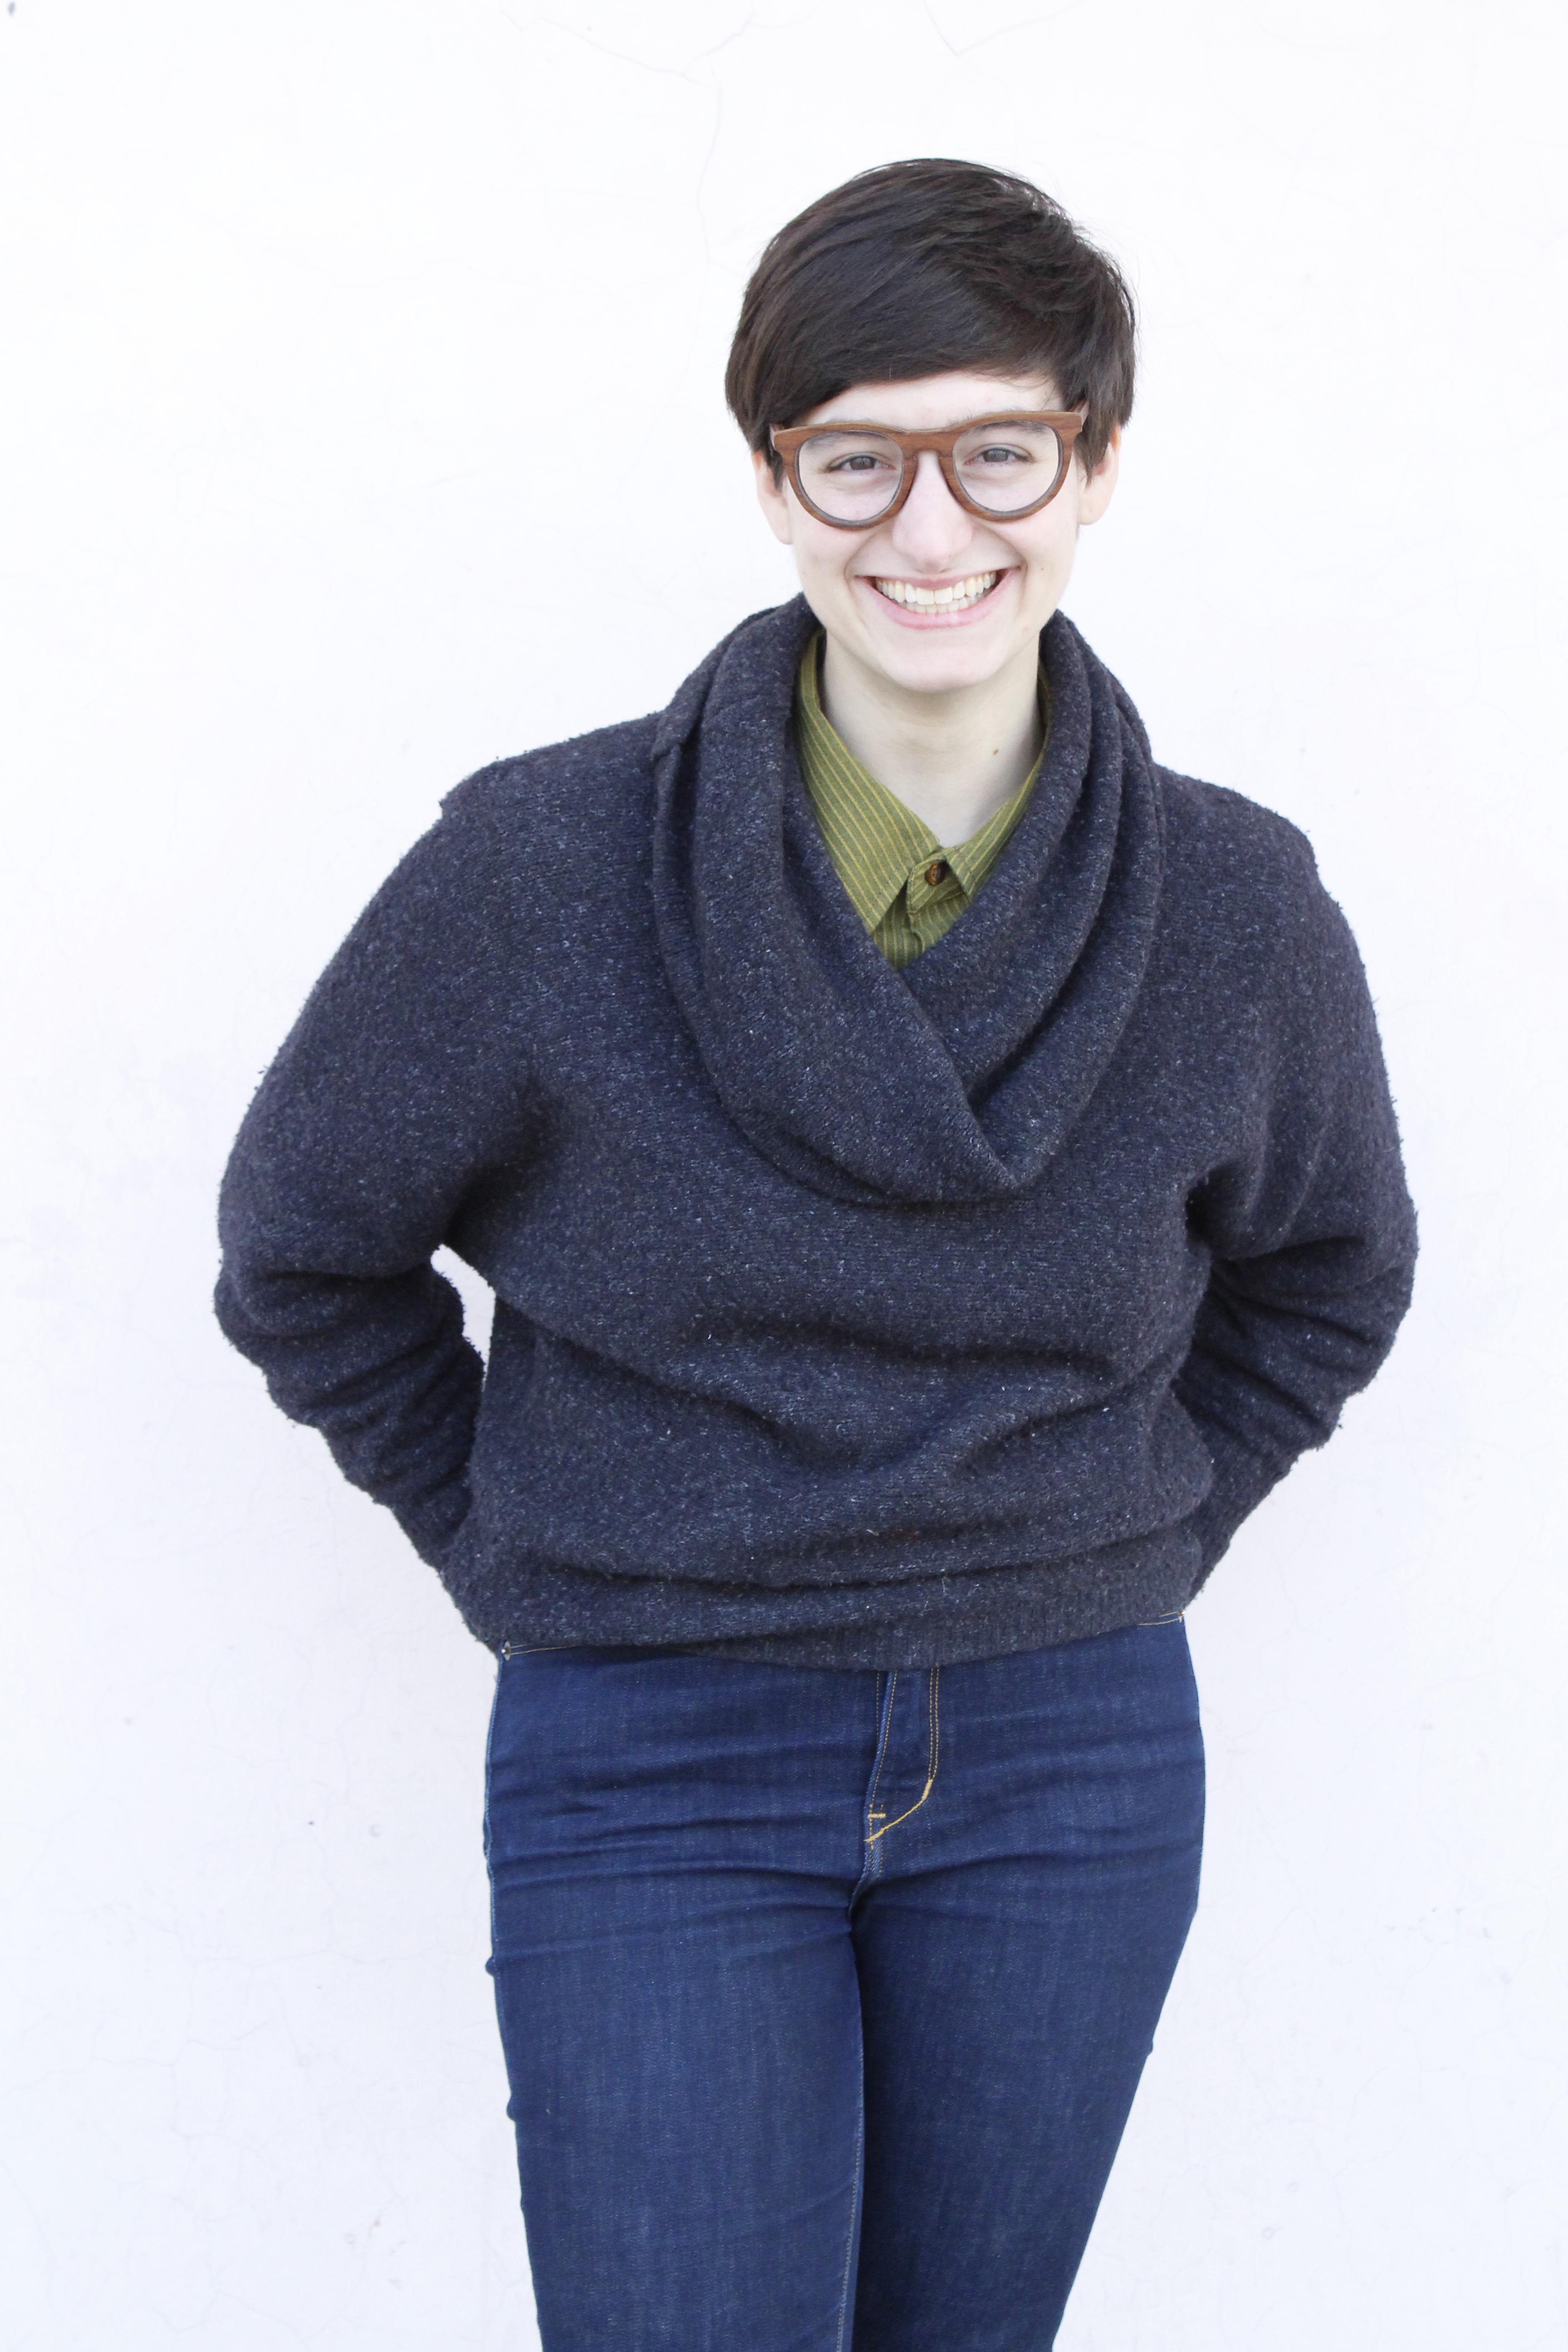 Karina Rosenstein